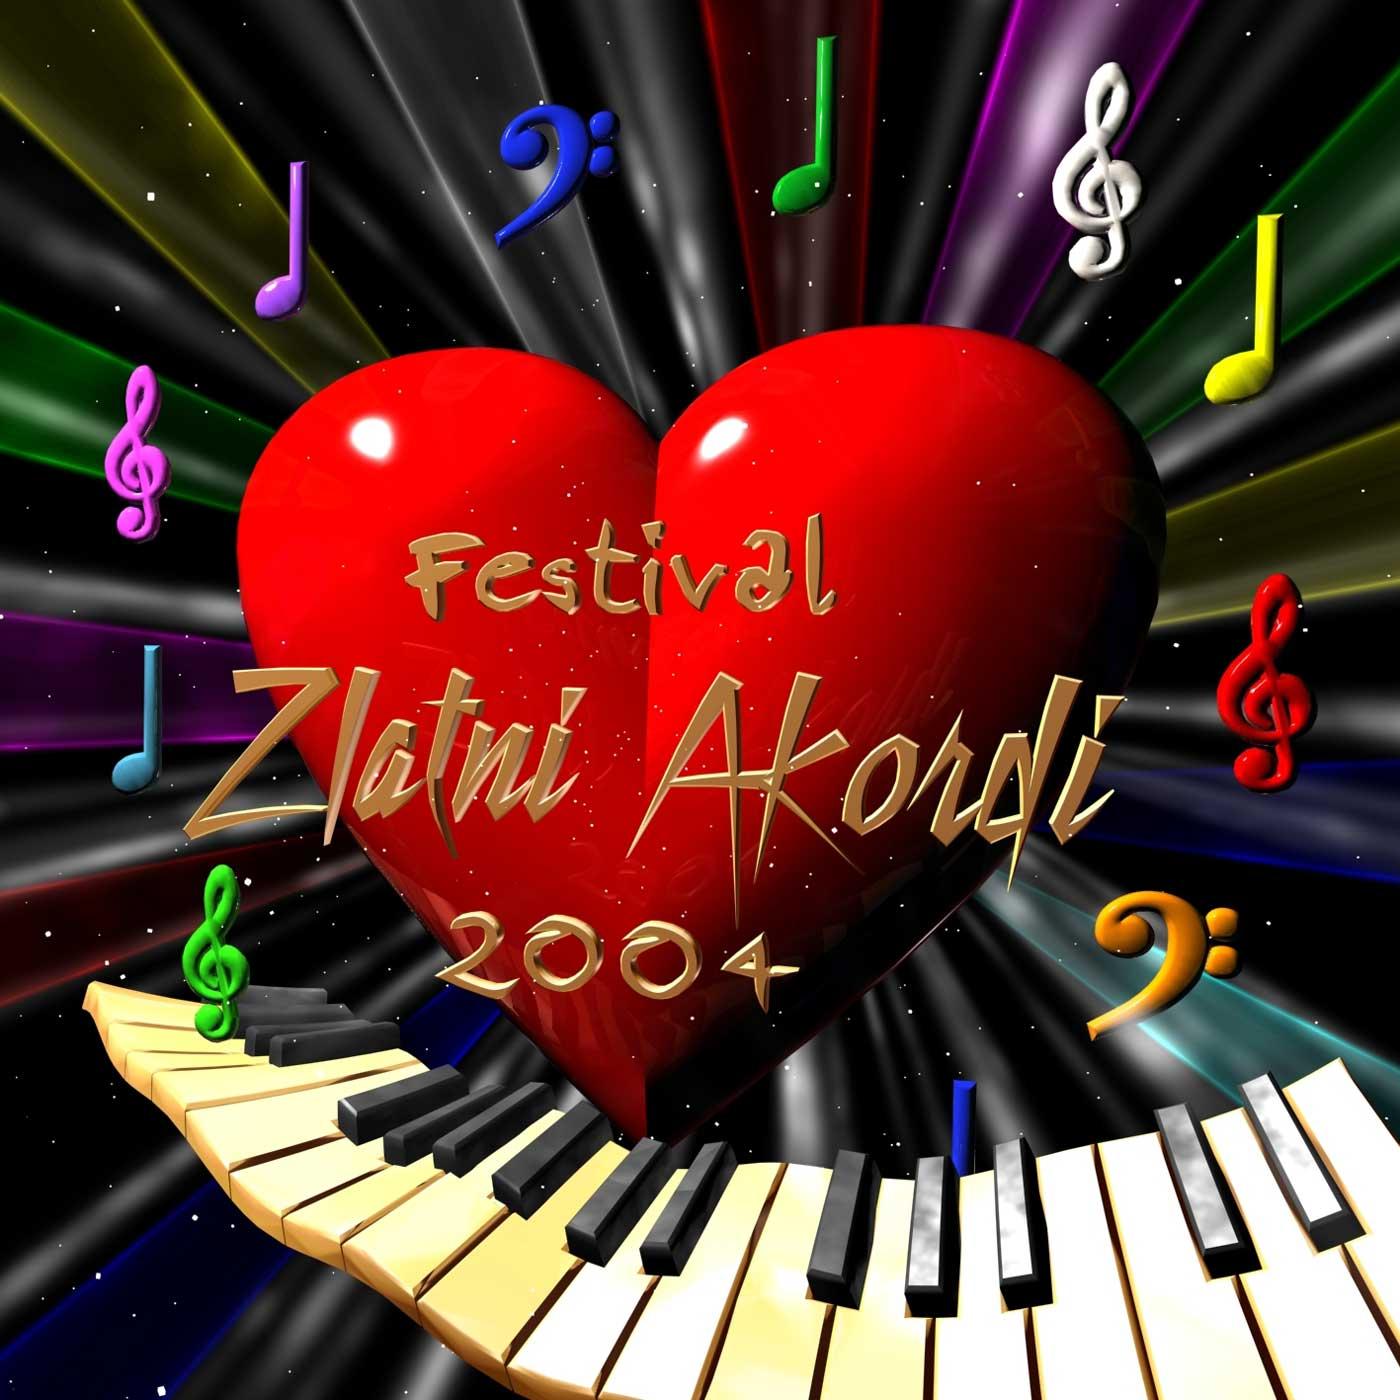 CD – Festival Zlatni Akordi (2004)